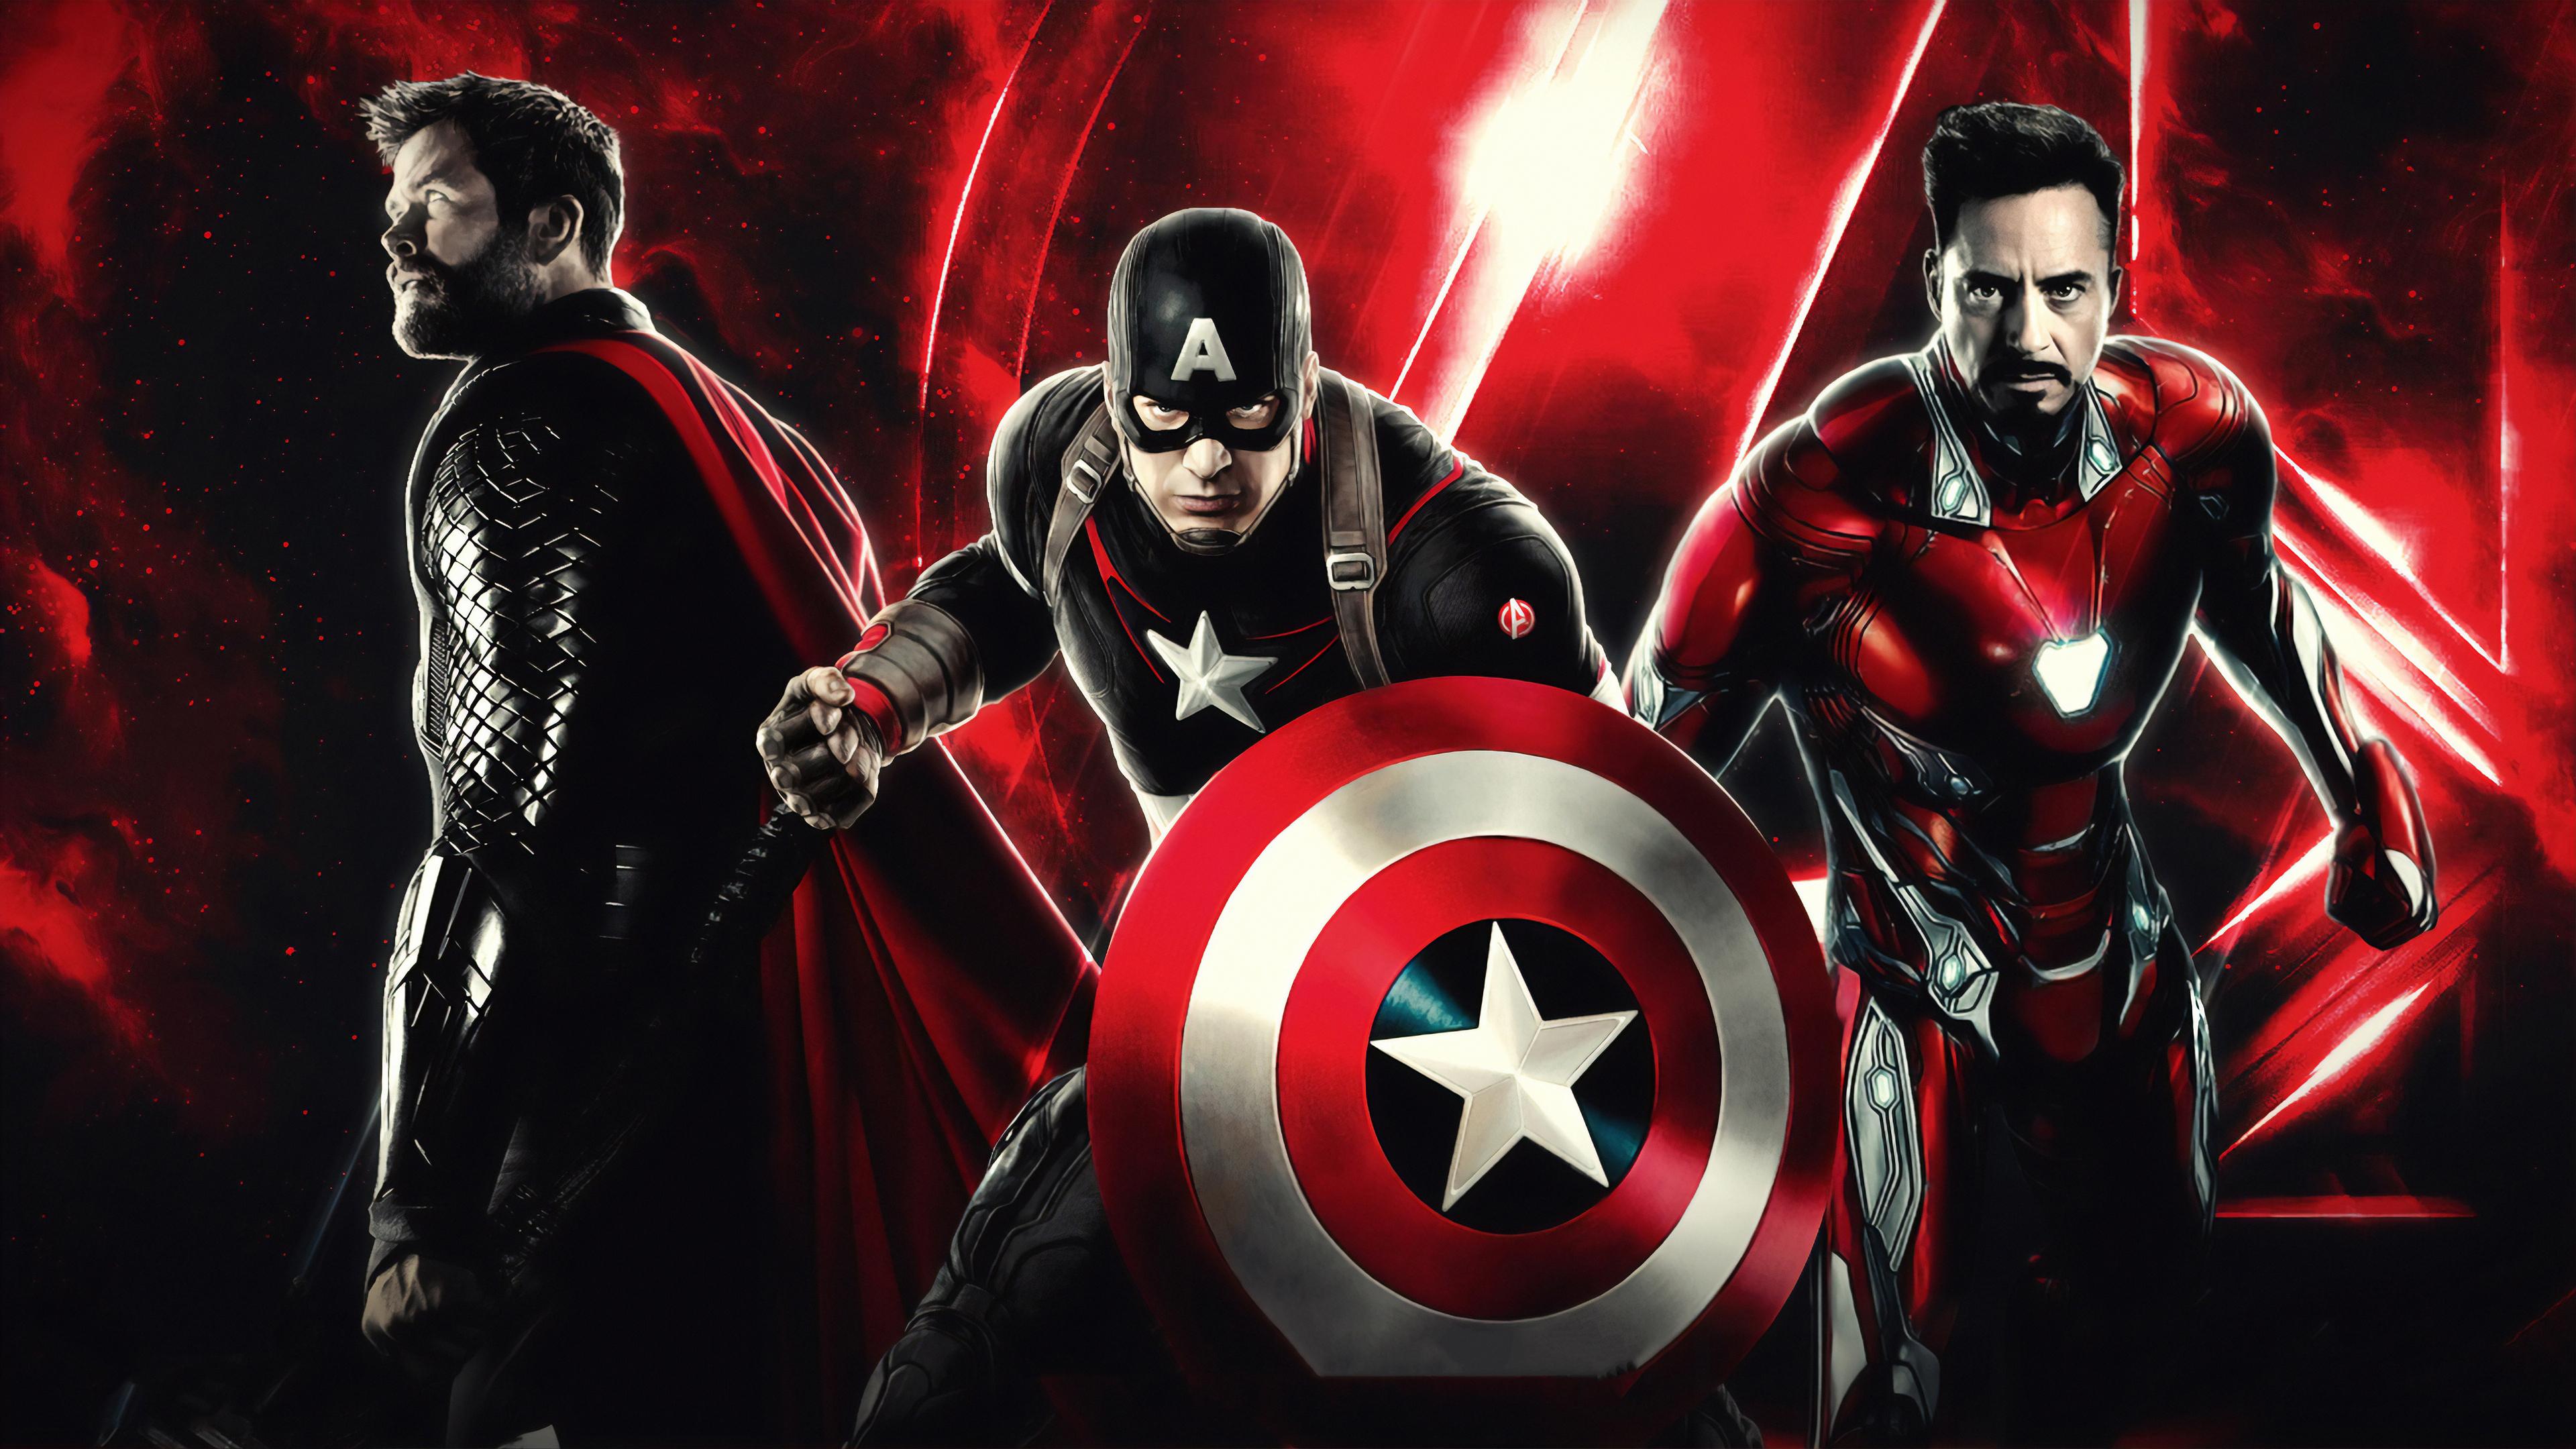 Avengers End Game 4k, HD Superheroes ...